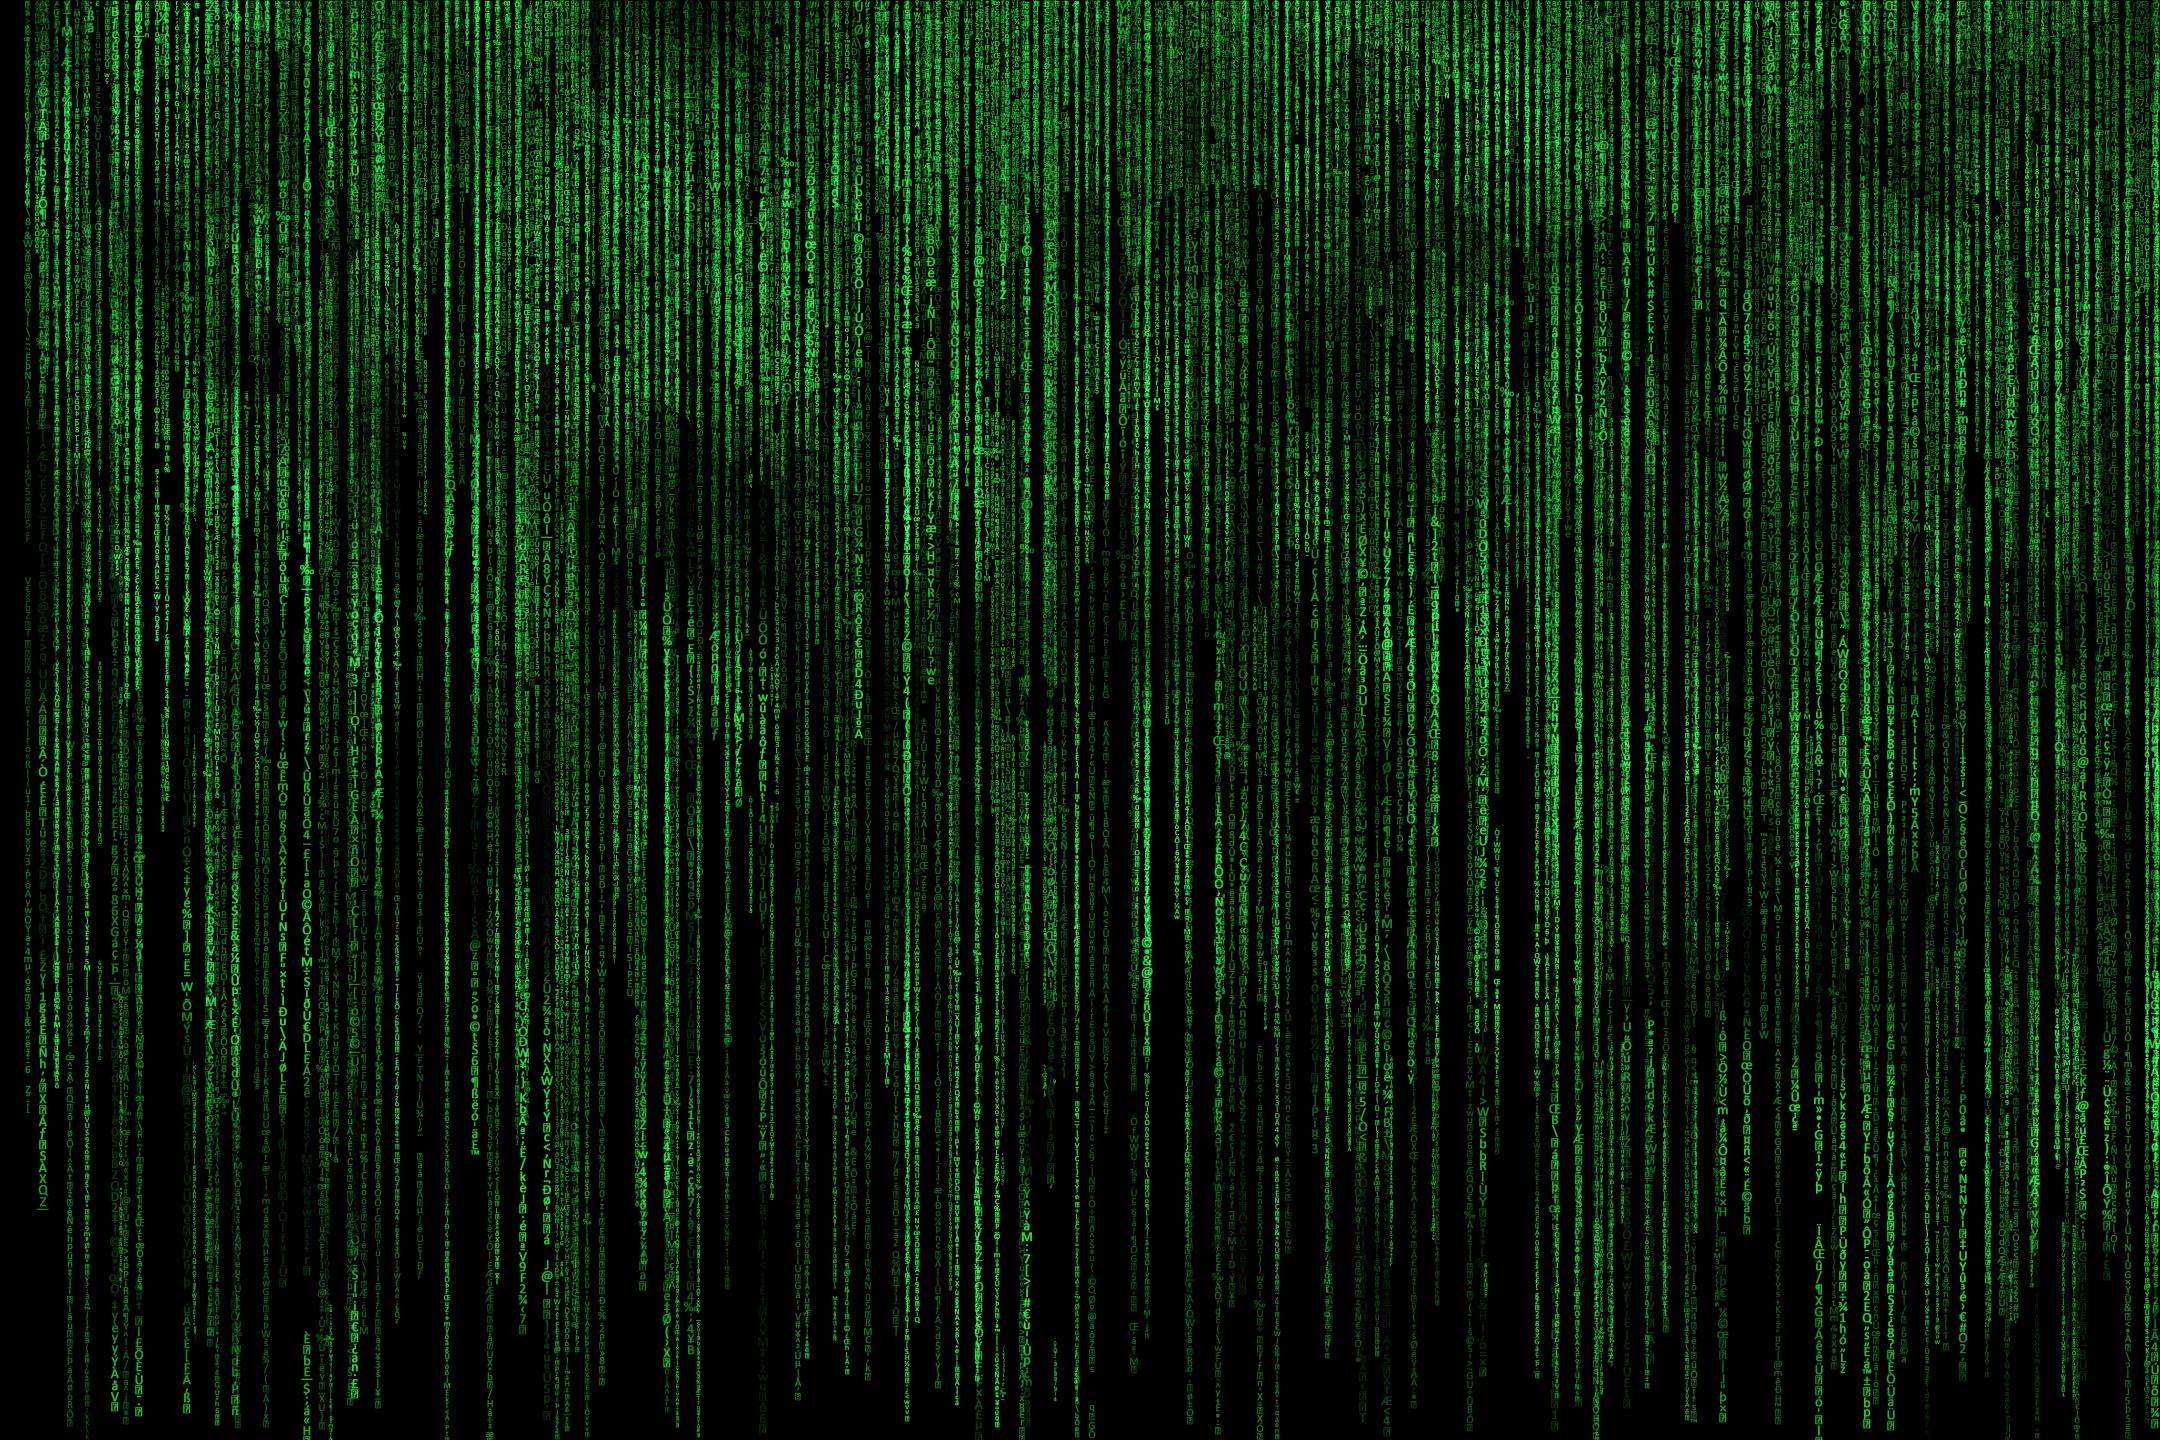 The Matrix Wallpapers Hintergrnde 2160x1440 ID649328